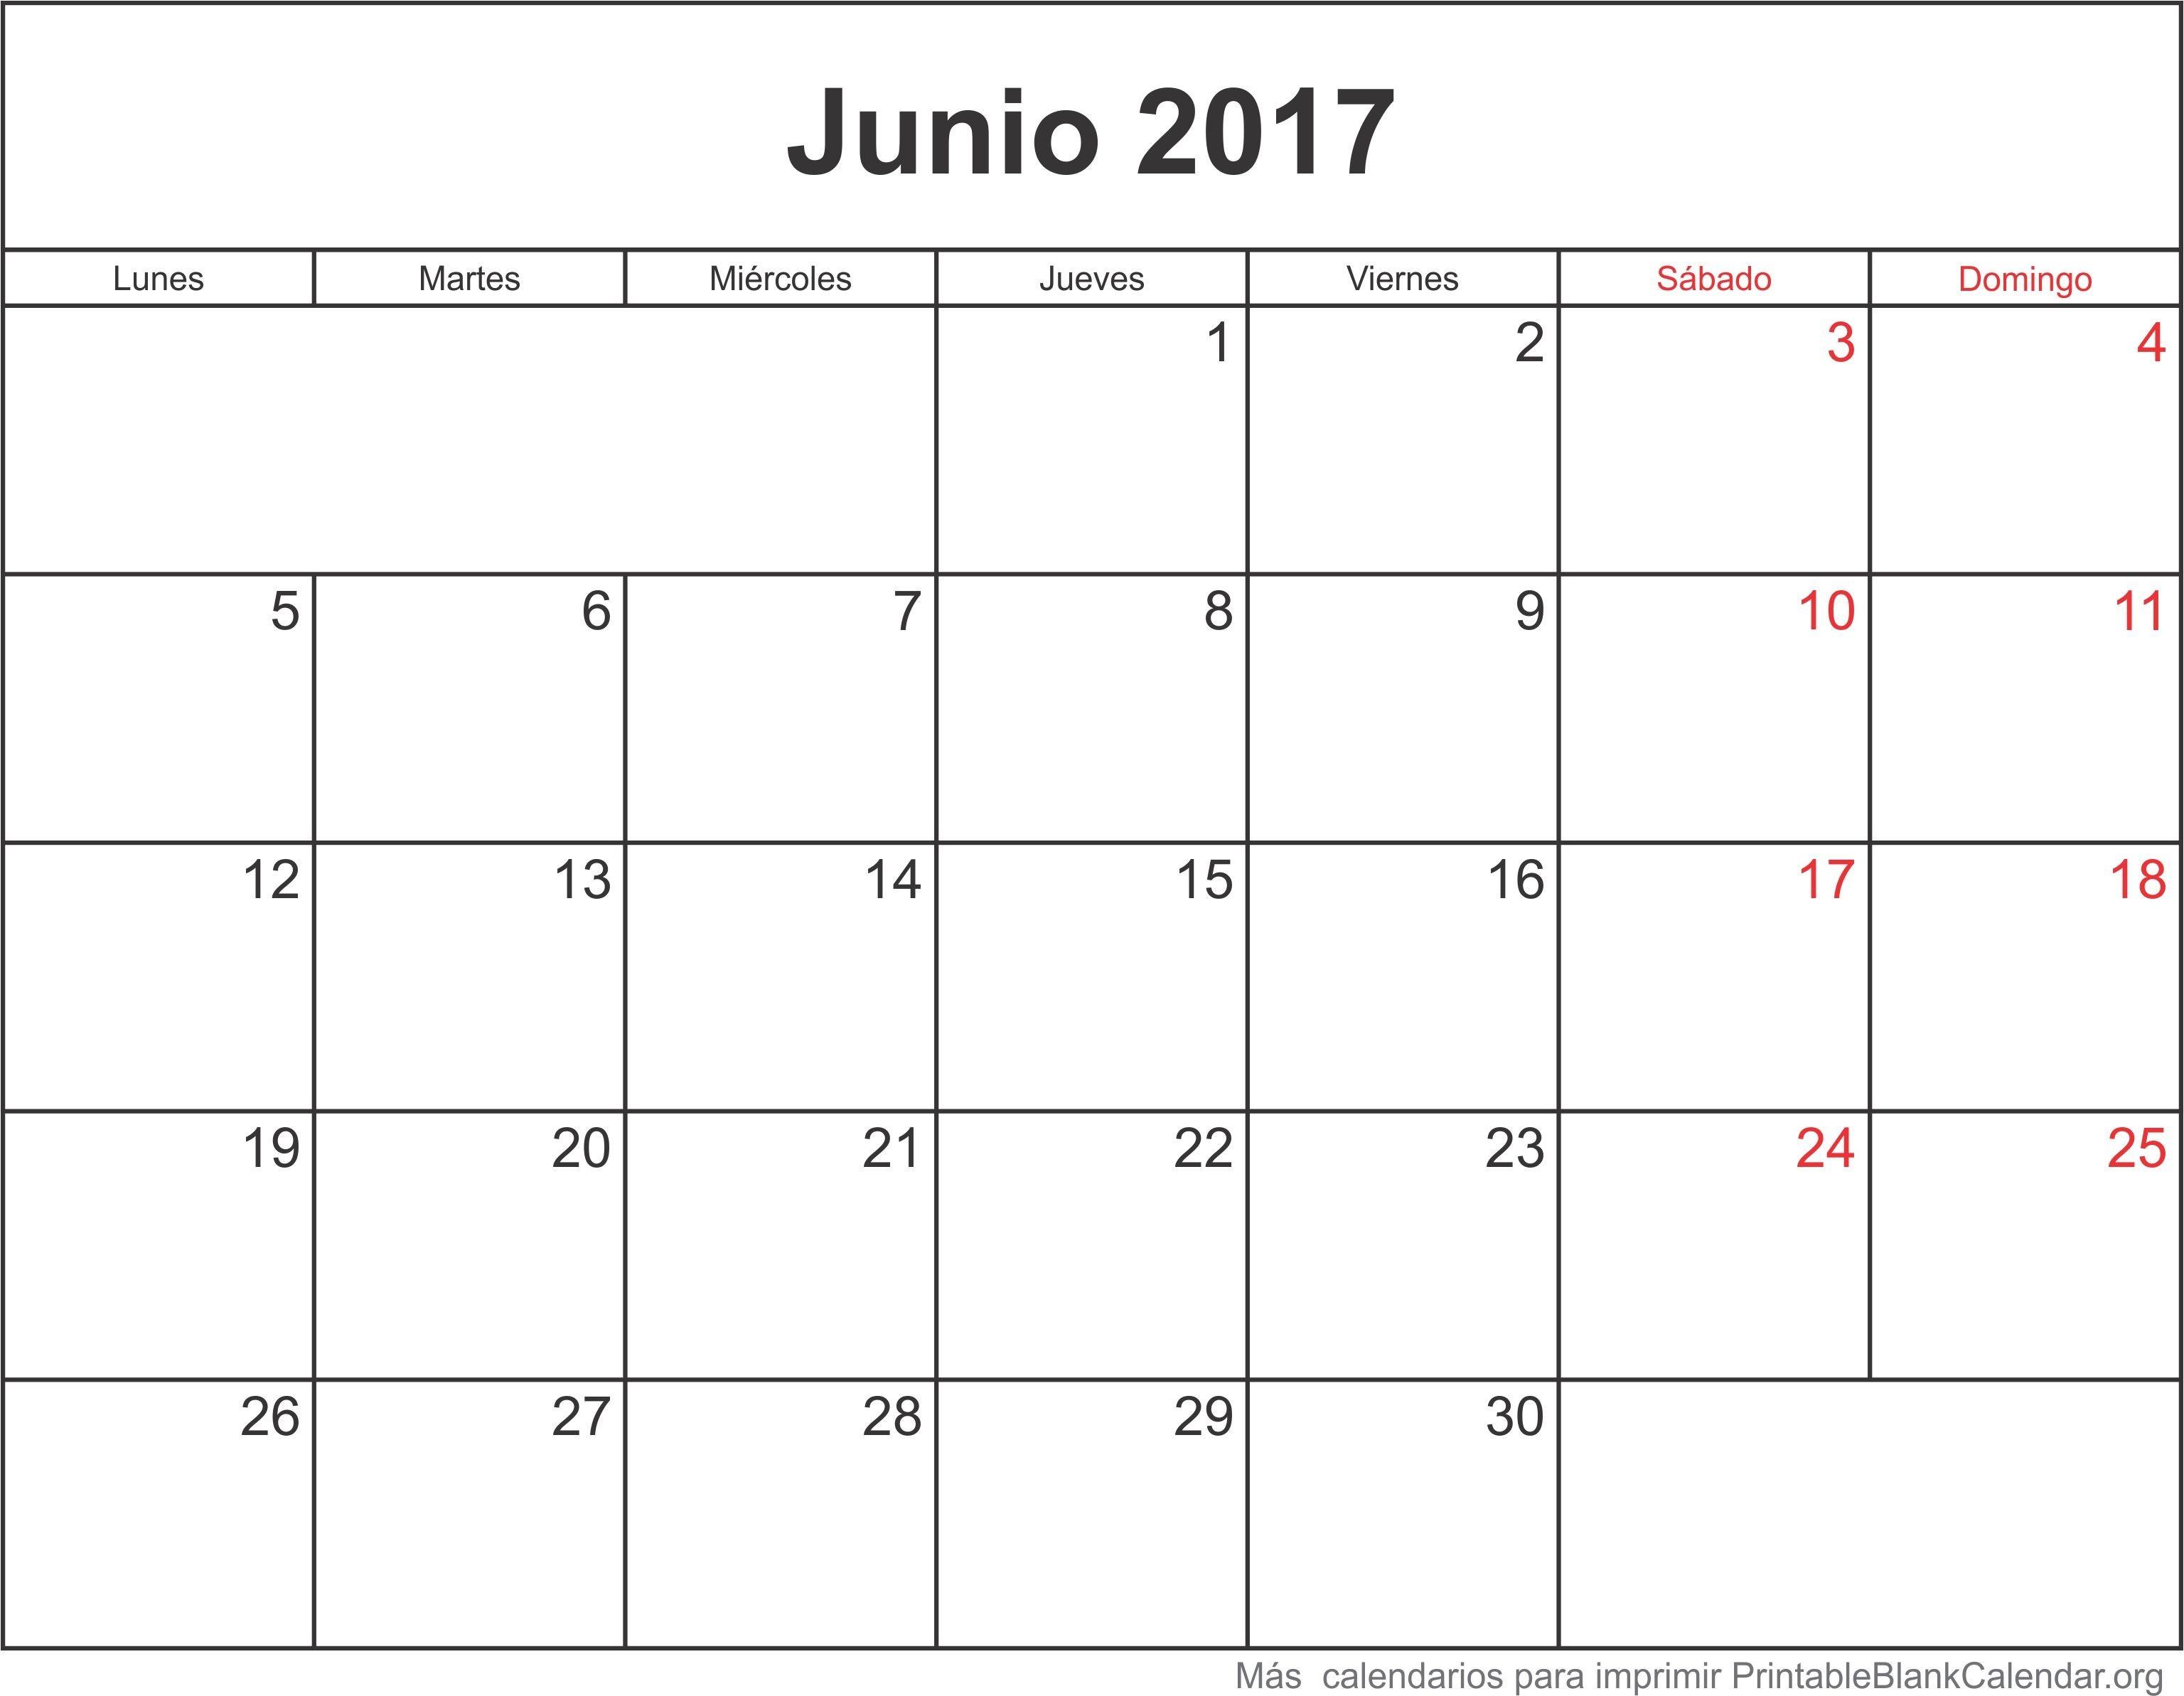 Calendario Jun 2017 Para Imprimir Junio 2017 Calendario